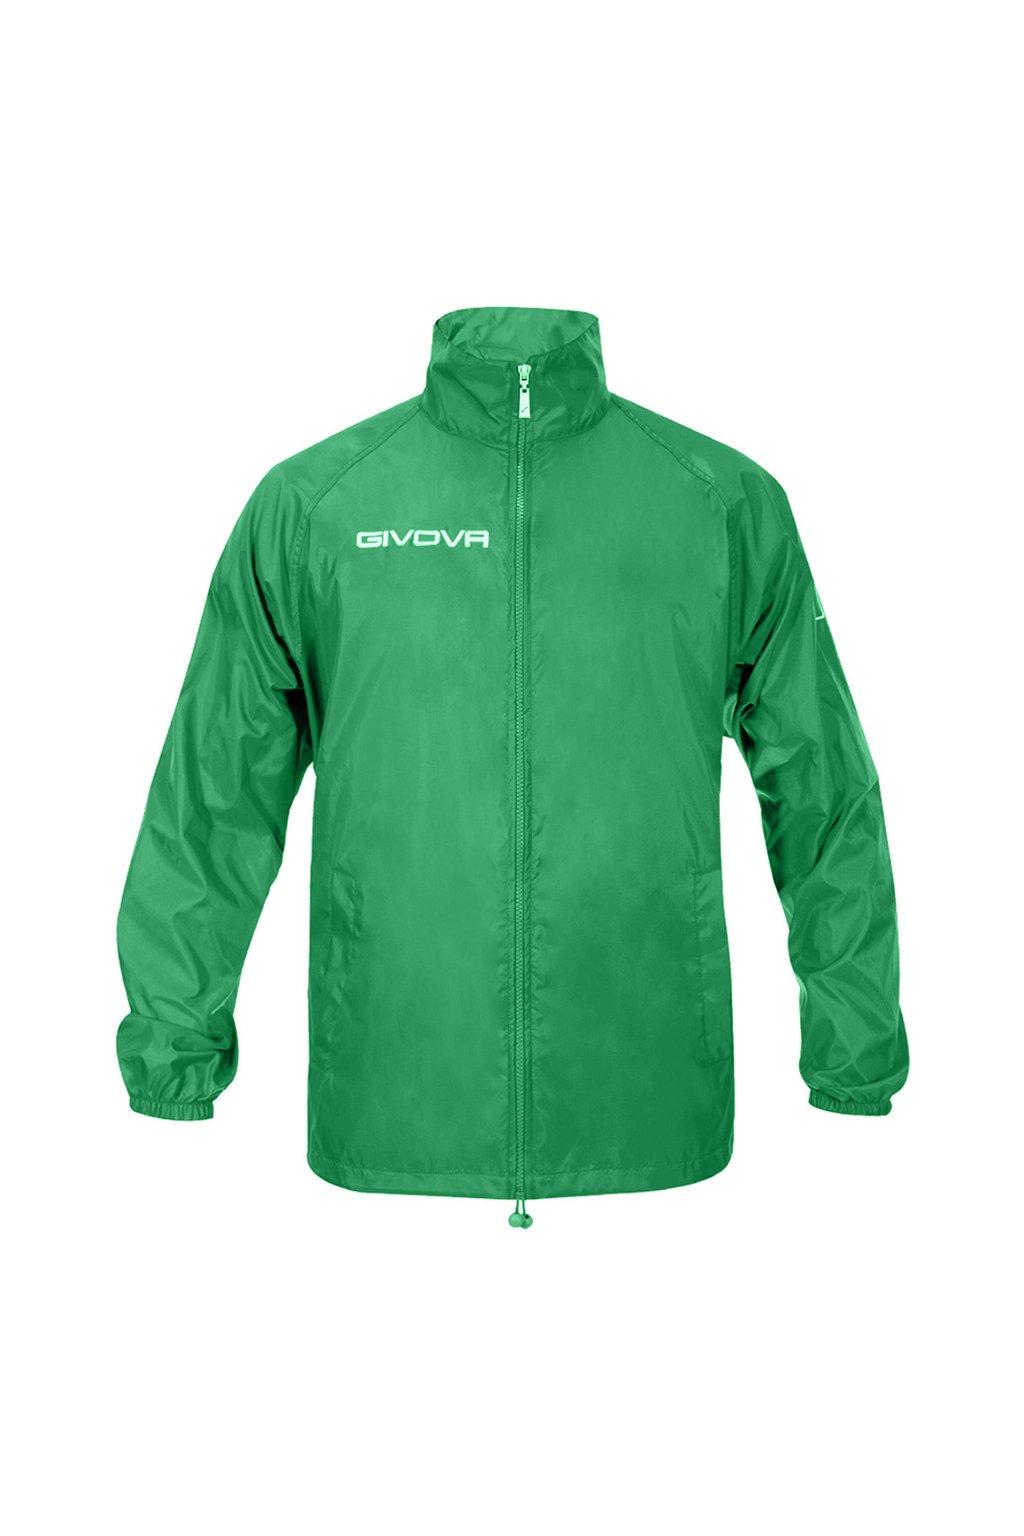 Bunda Givova Rain Basico zelená RJ001 0013